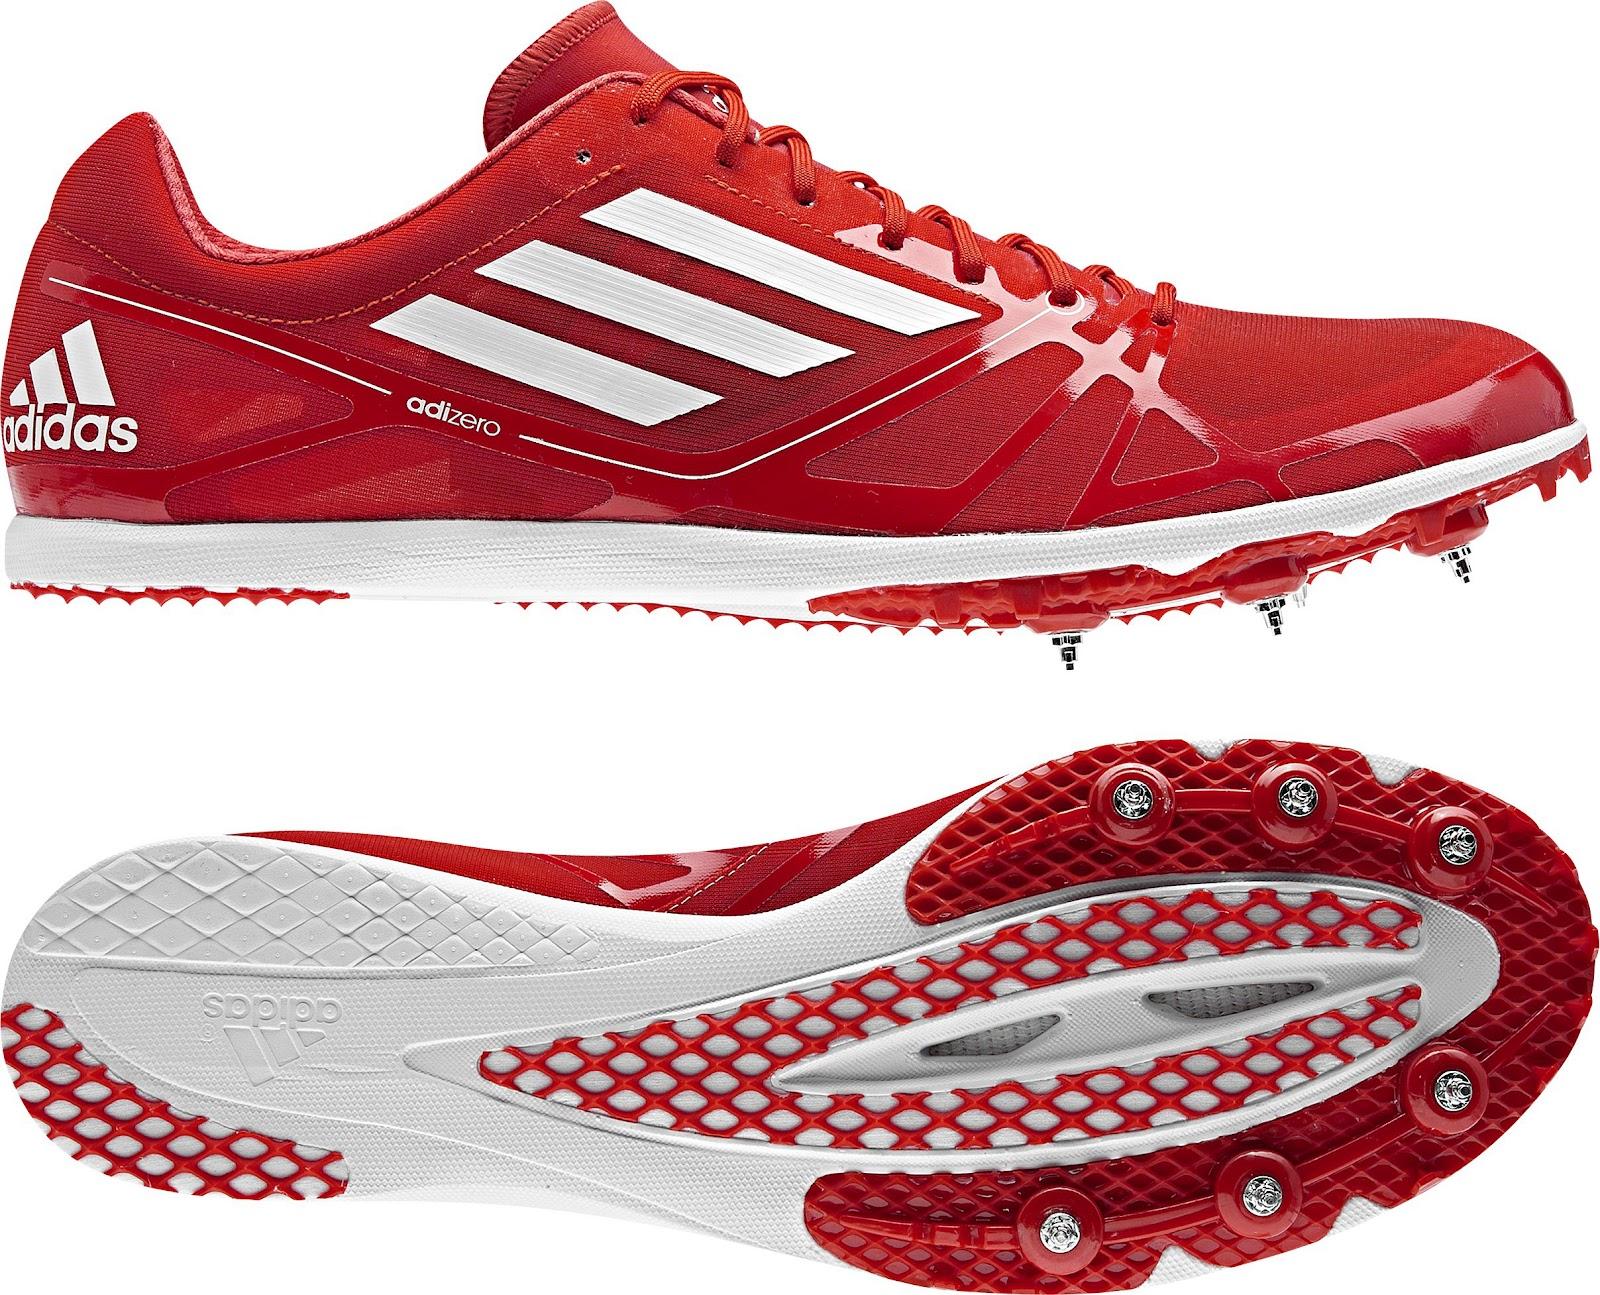 adidas adizero spikes 2012